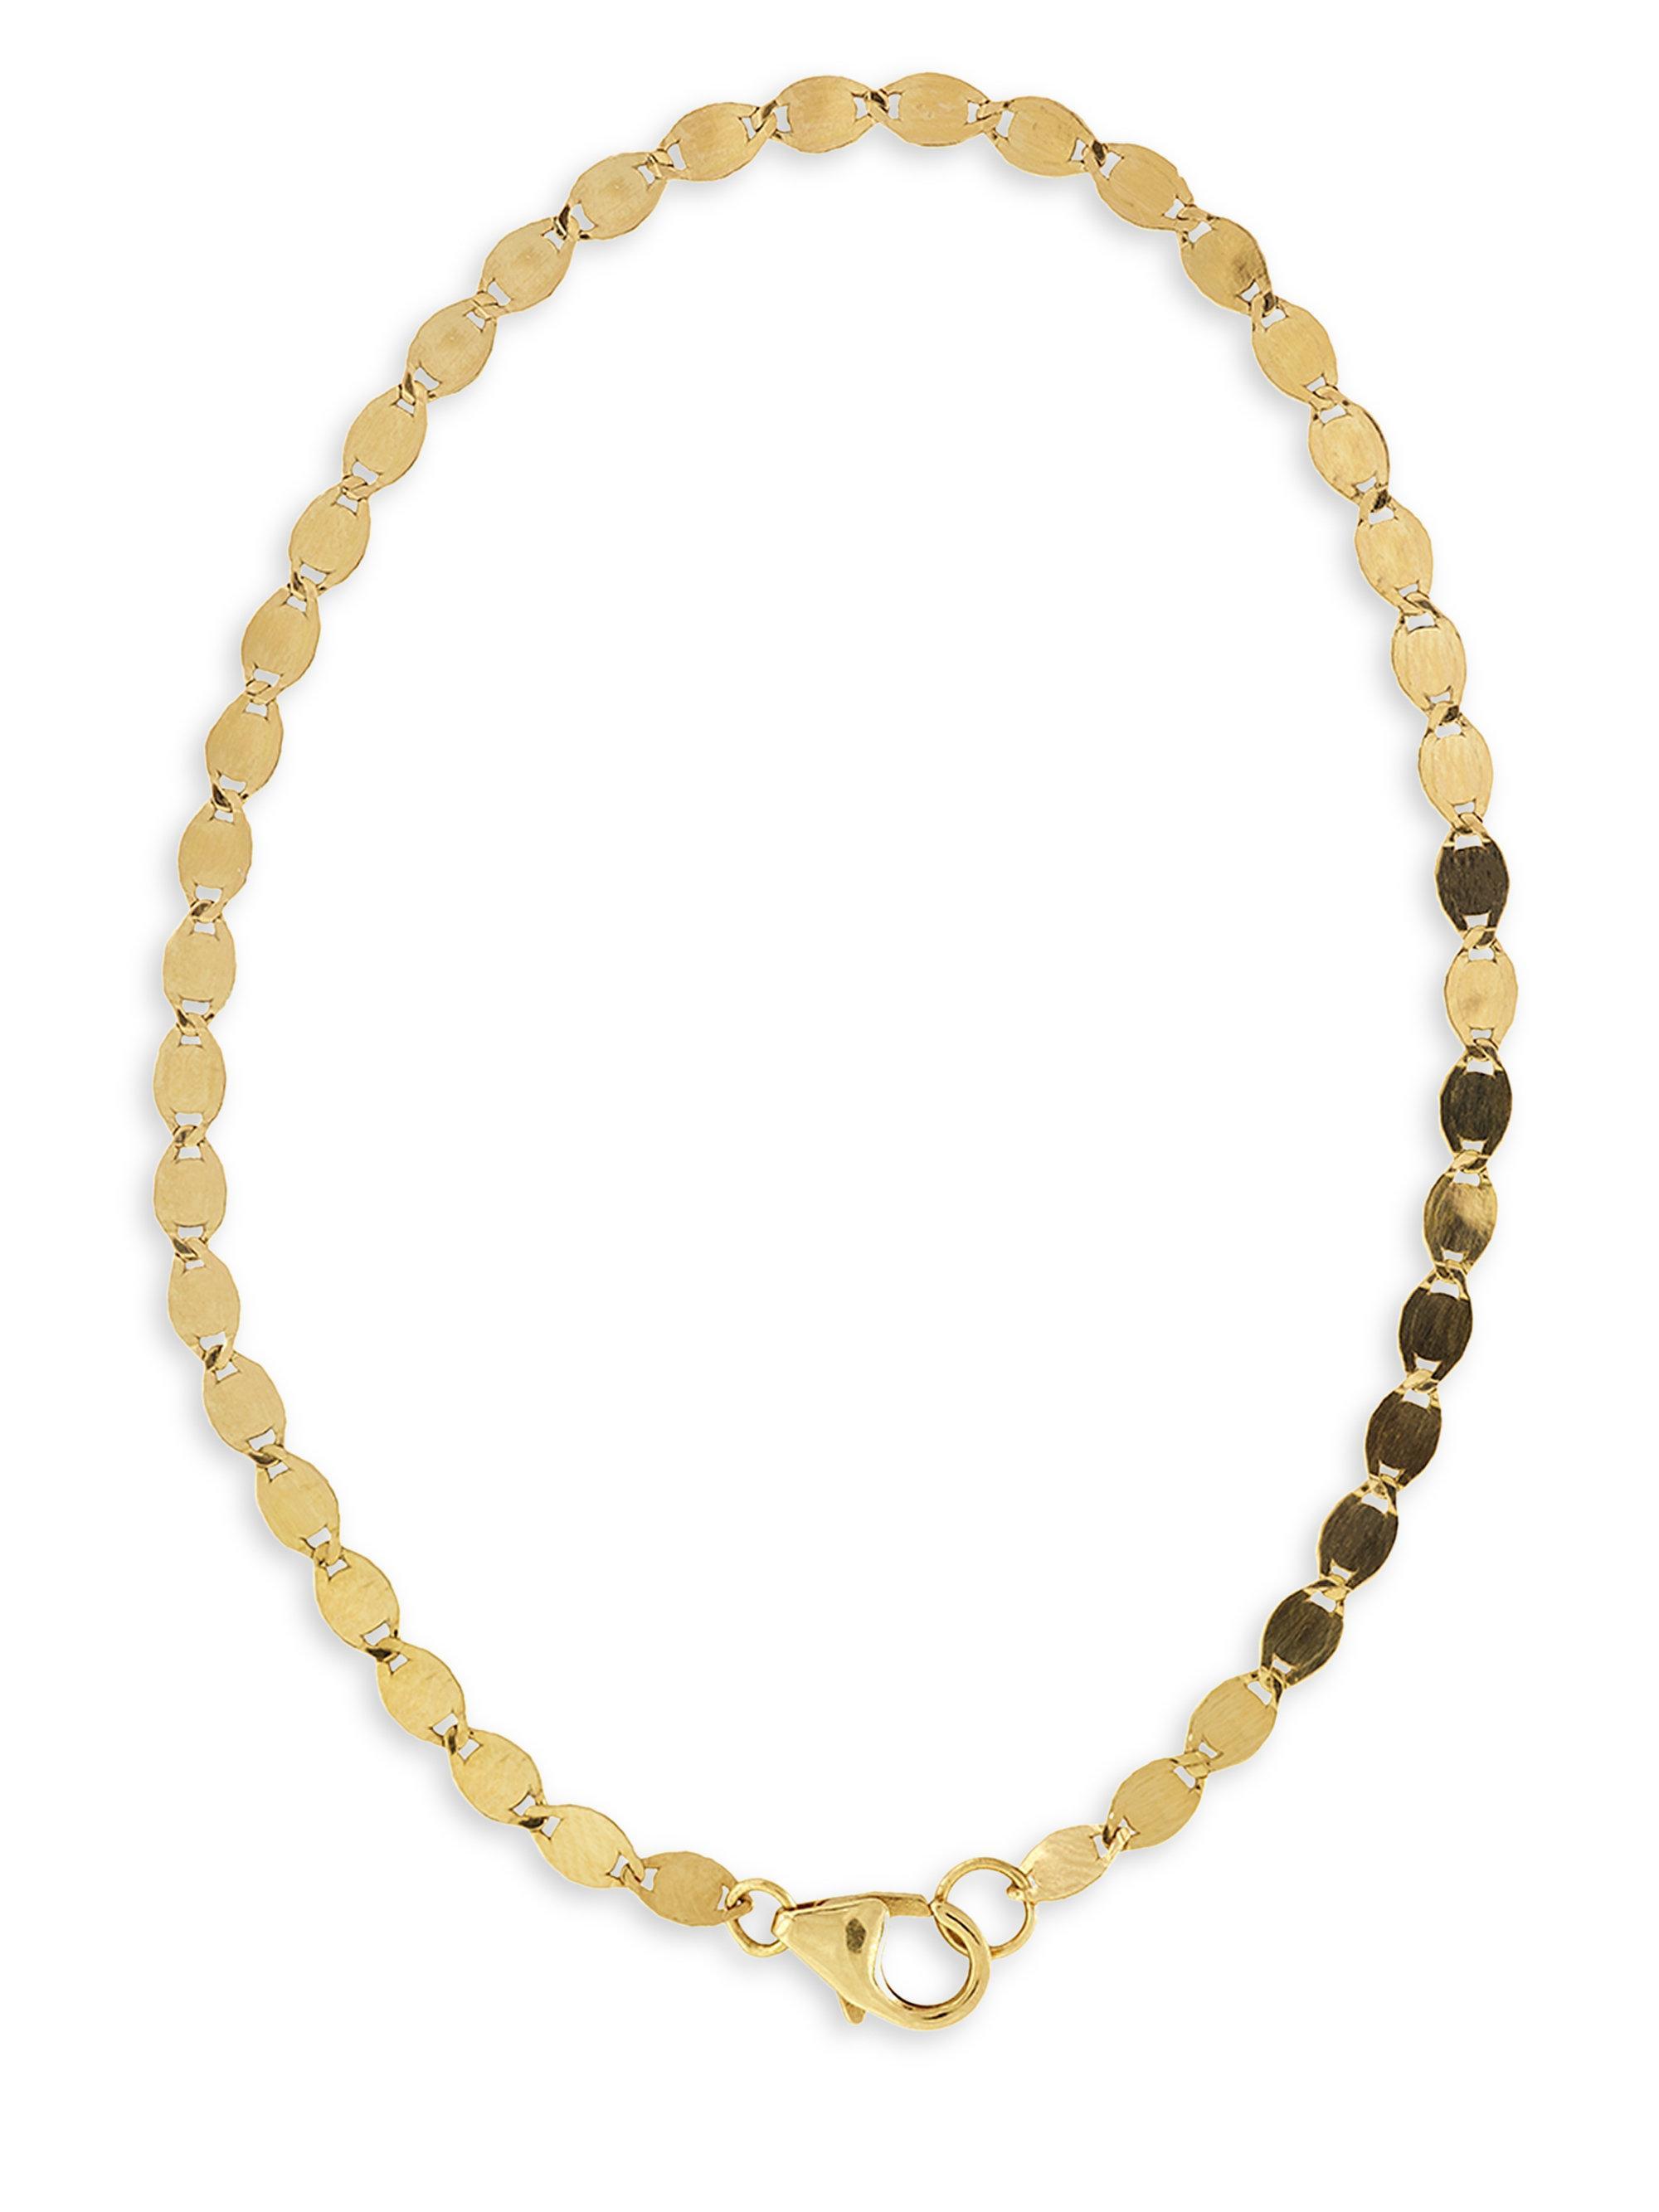 Lana Jewelry 14k Mini Kite Chain Bracelet kJmOZbKl